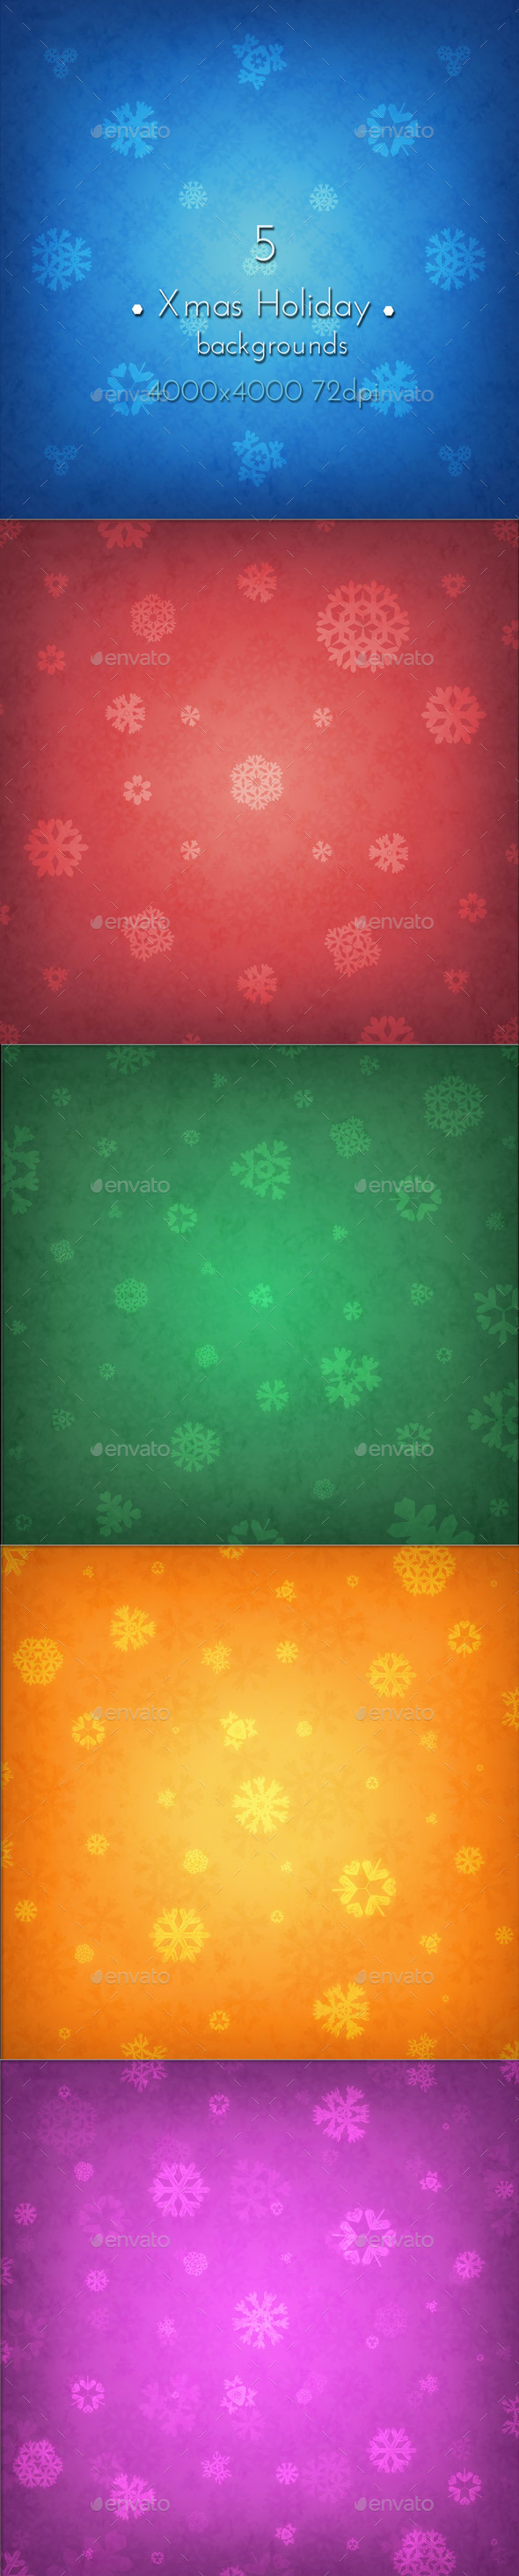 Christmas Holiday Pattern - Patterns Backgrounds